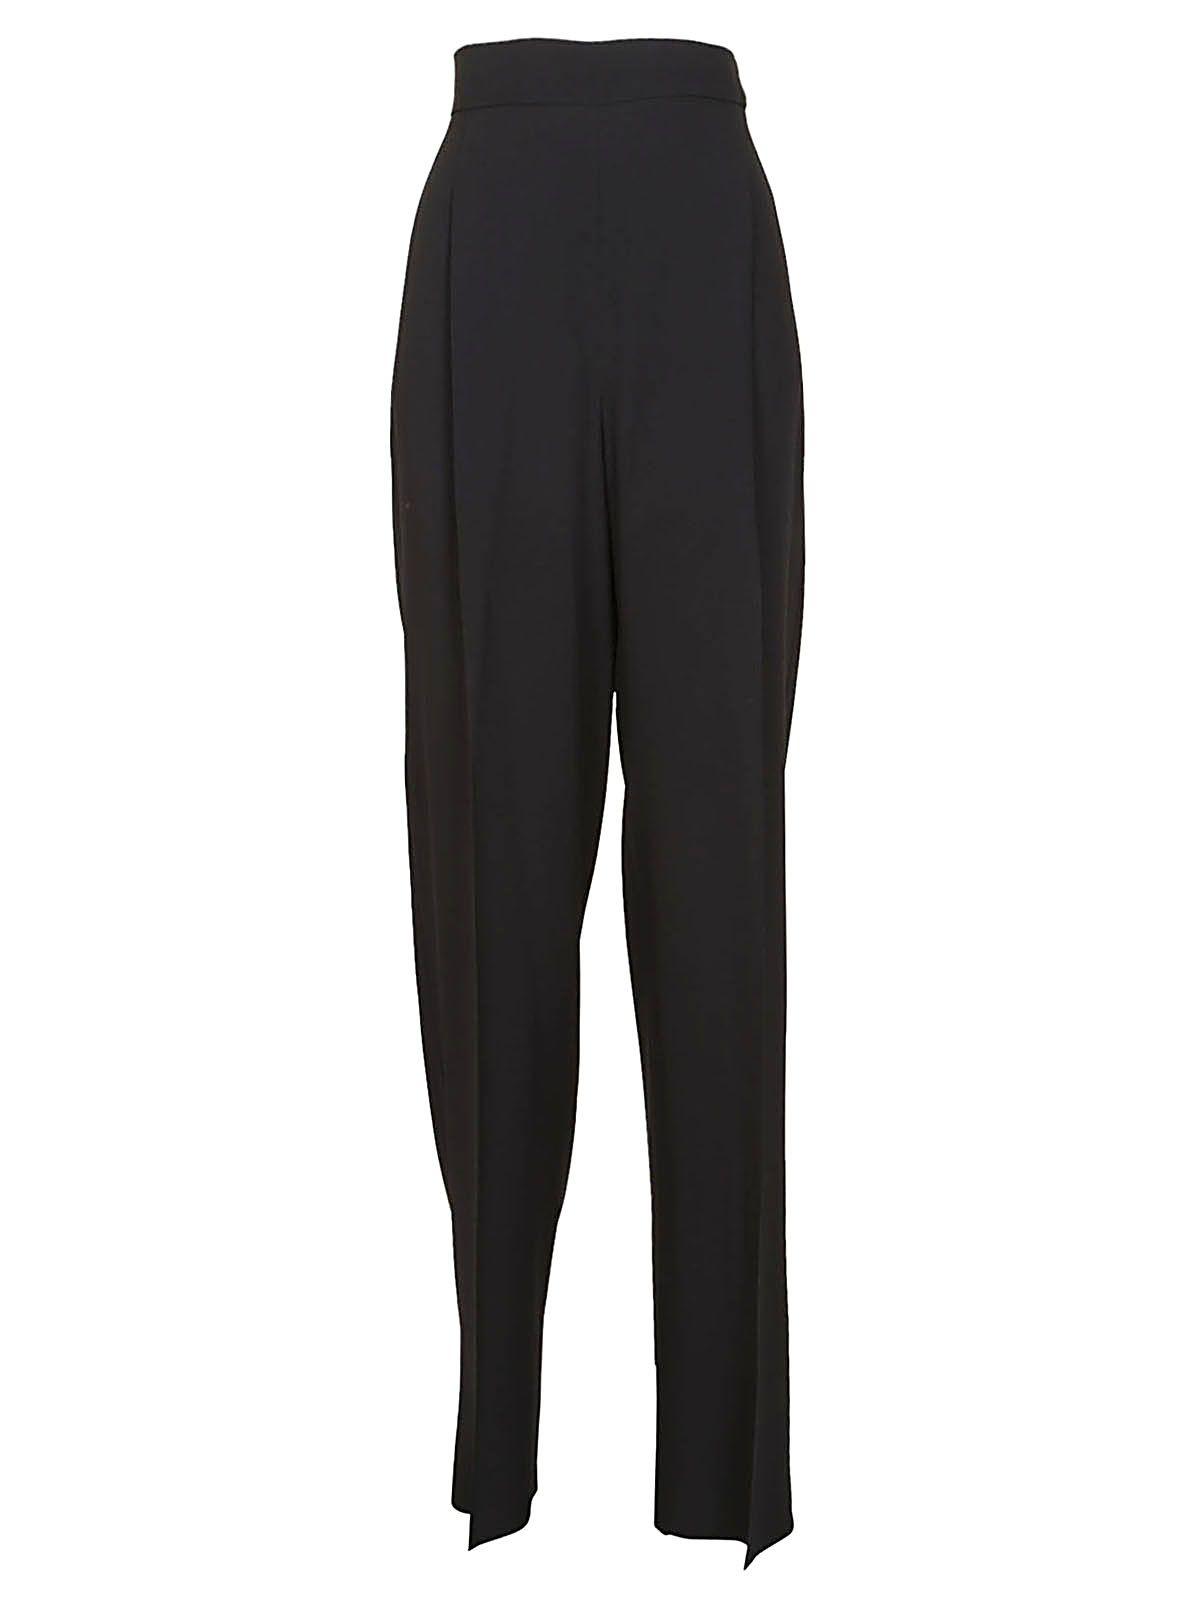 Max Mara High Waisted Trousers